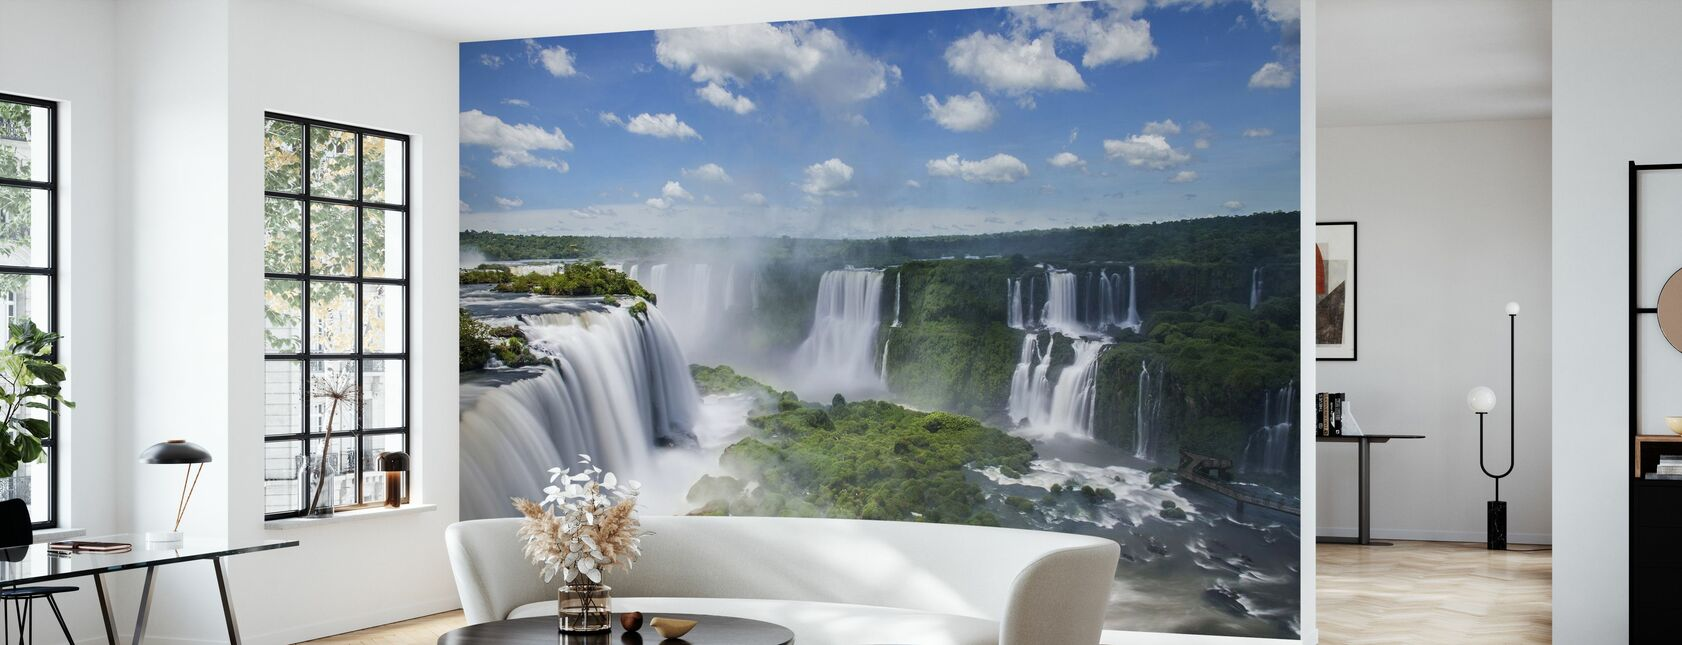 Iguazu Waterfall - Wallpaper - Living Room